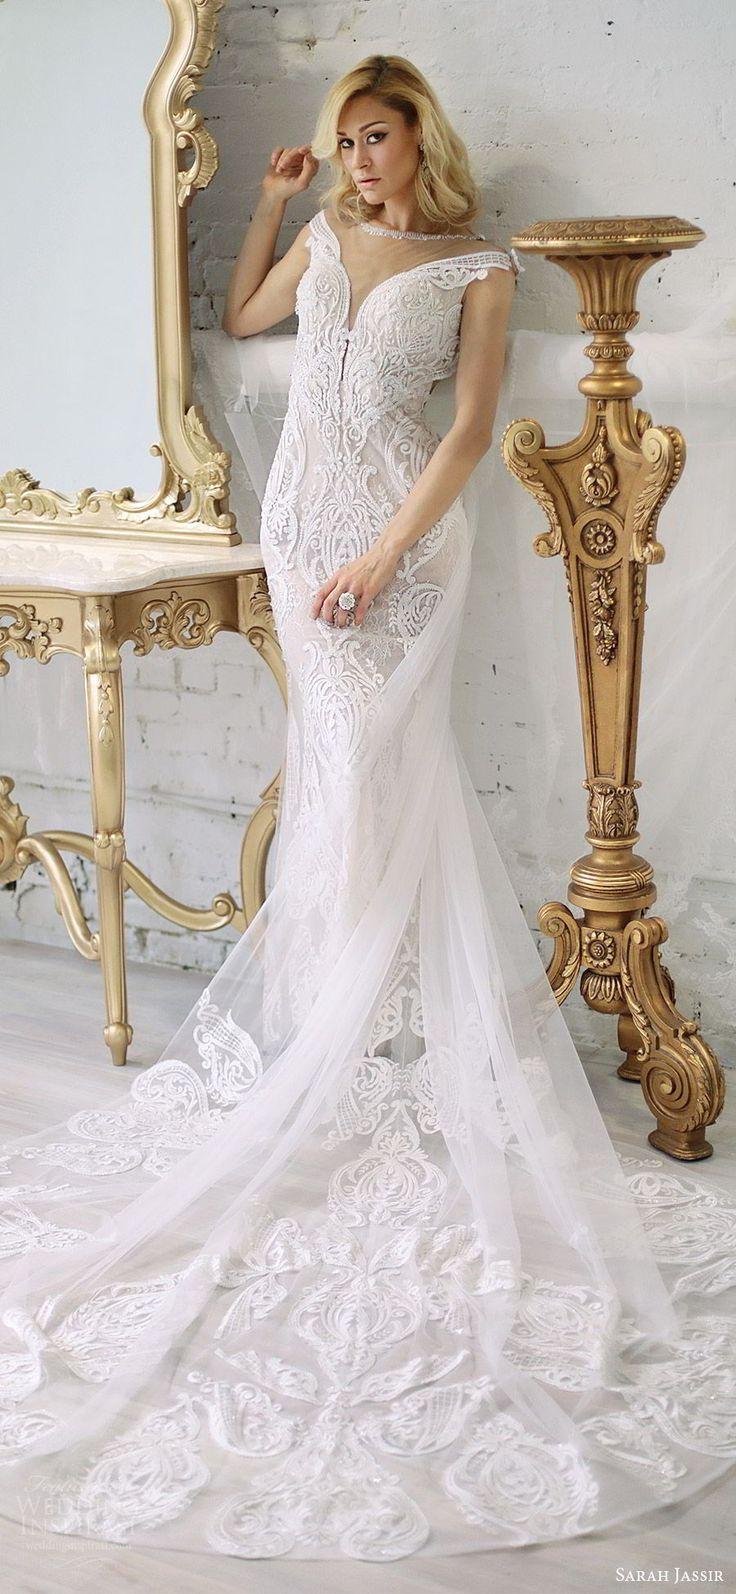 sarah jassir bridal 2018 off shoulder deep v neck illusion jewel neckline cap sleeves sheath lace wedding dress (andi) mv chapel train elegant -- Sarah Jassir 2018 Wedding Dresses